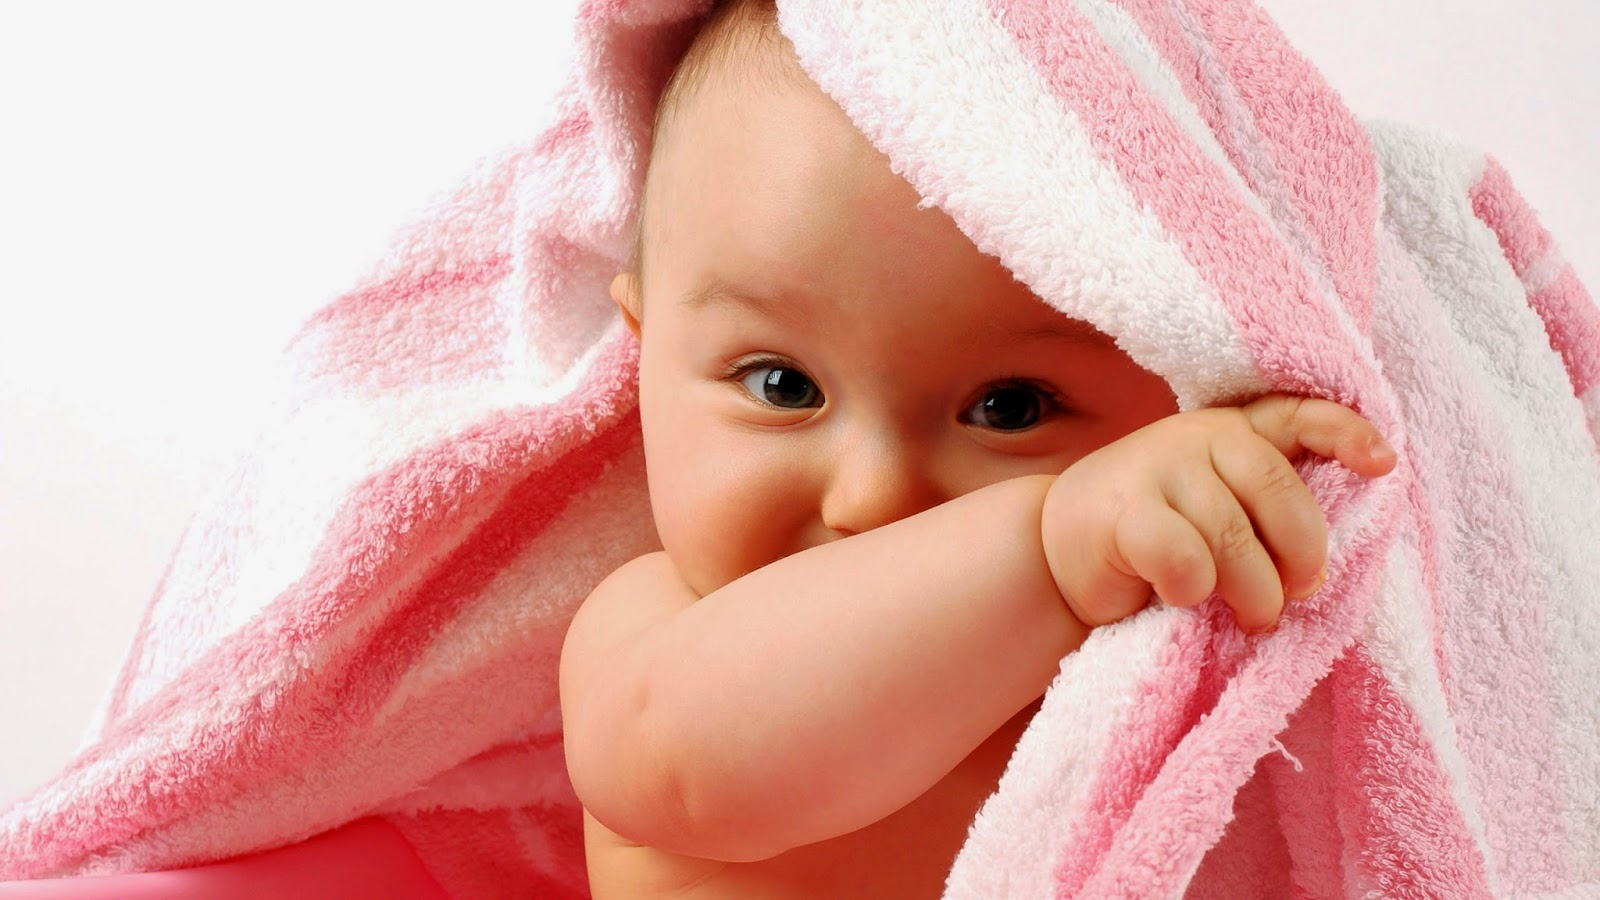 Bayi Lucu Gambar Dan Video Bayi Lucu Banget Terbaru 2016